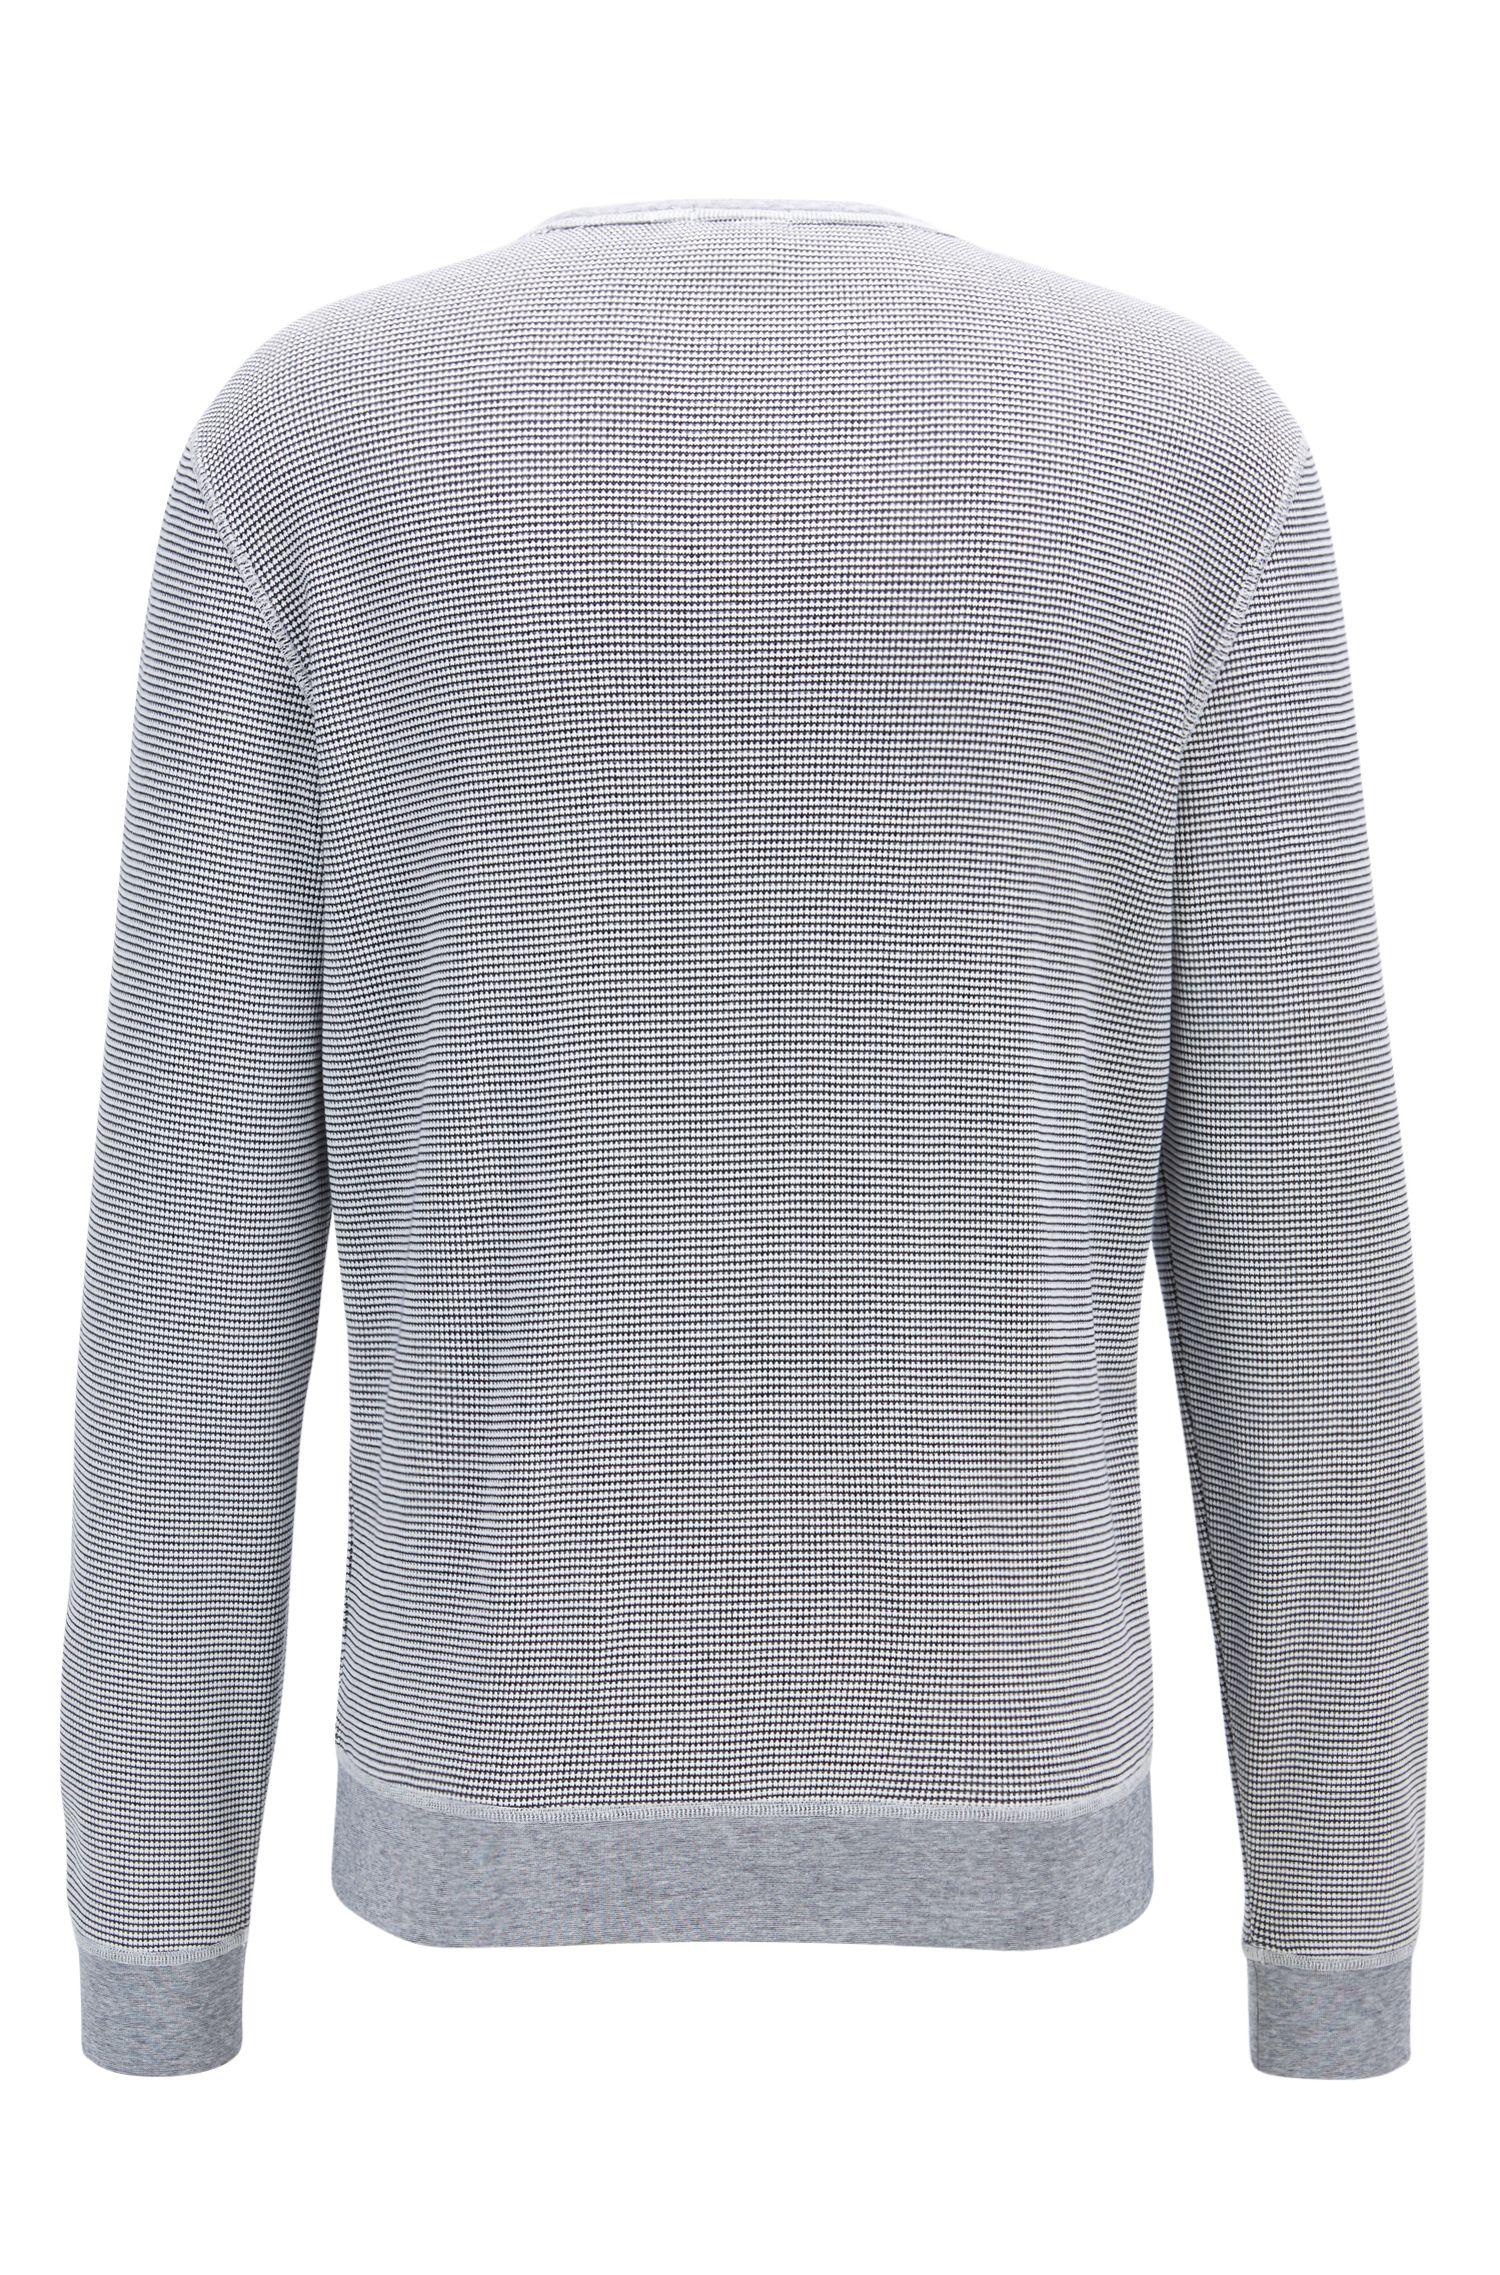 Cotton Knit Sweatshirt | Skubic